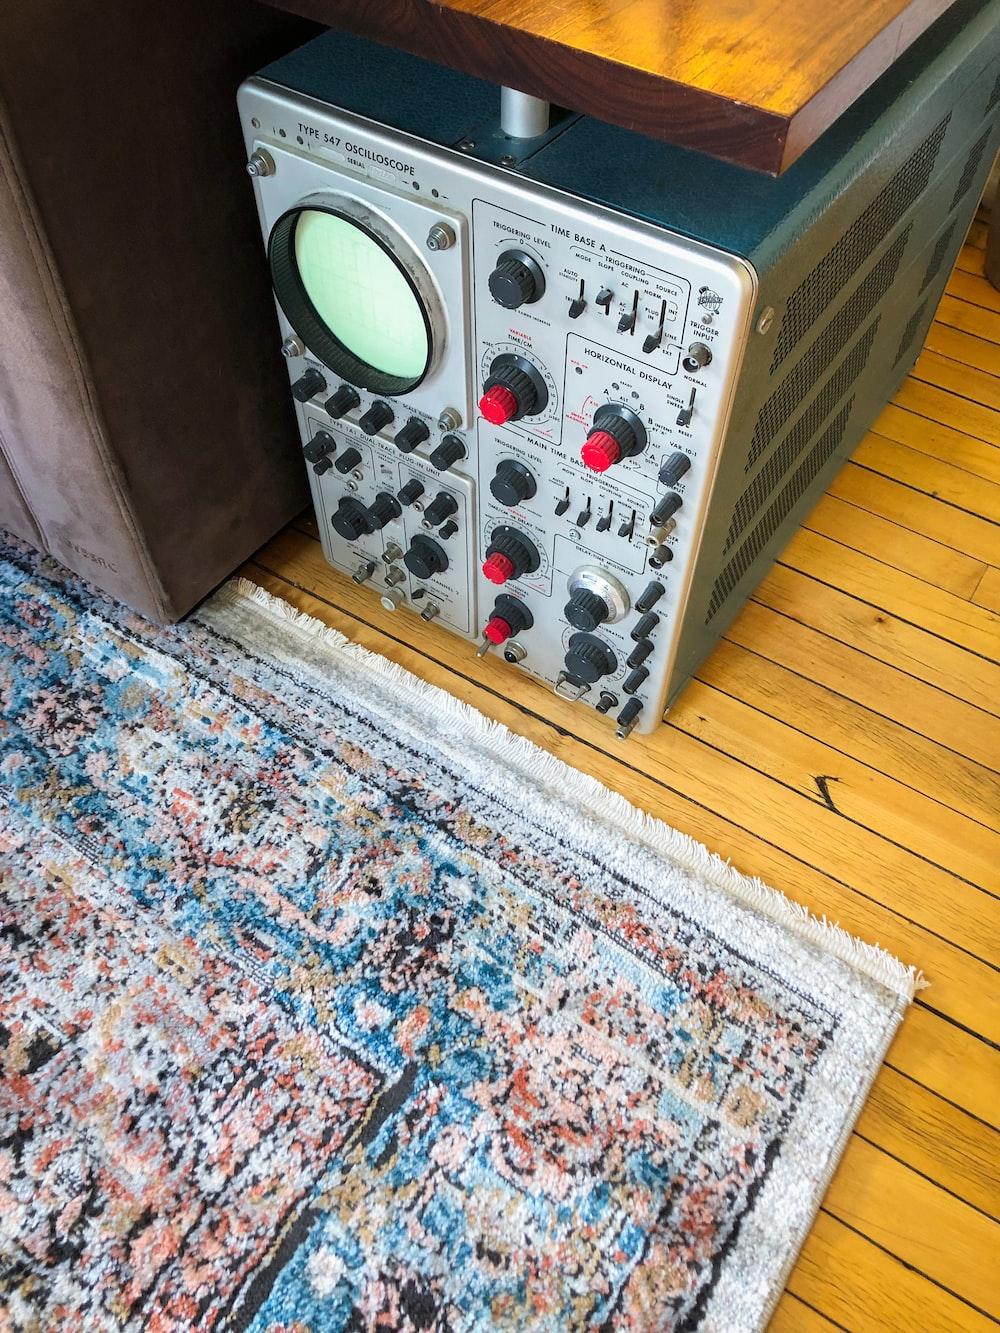 white and green remote control